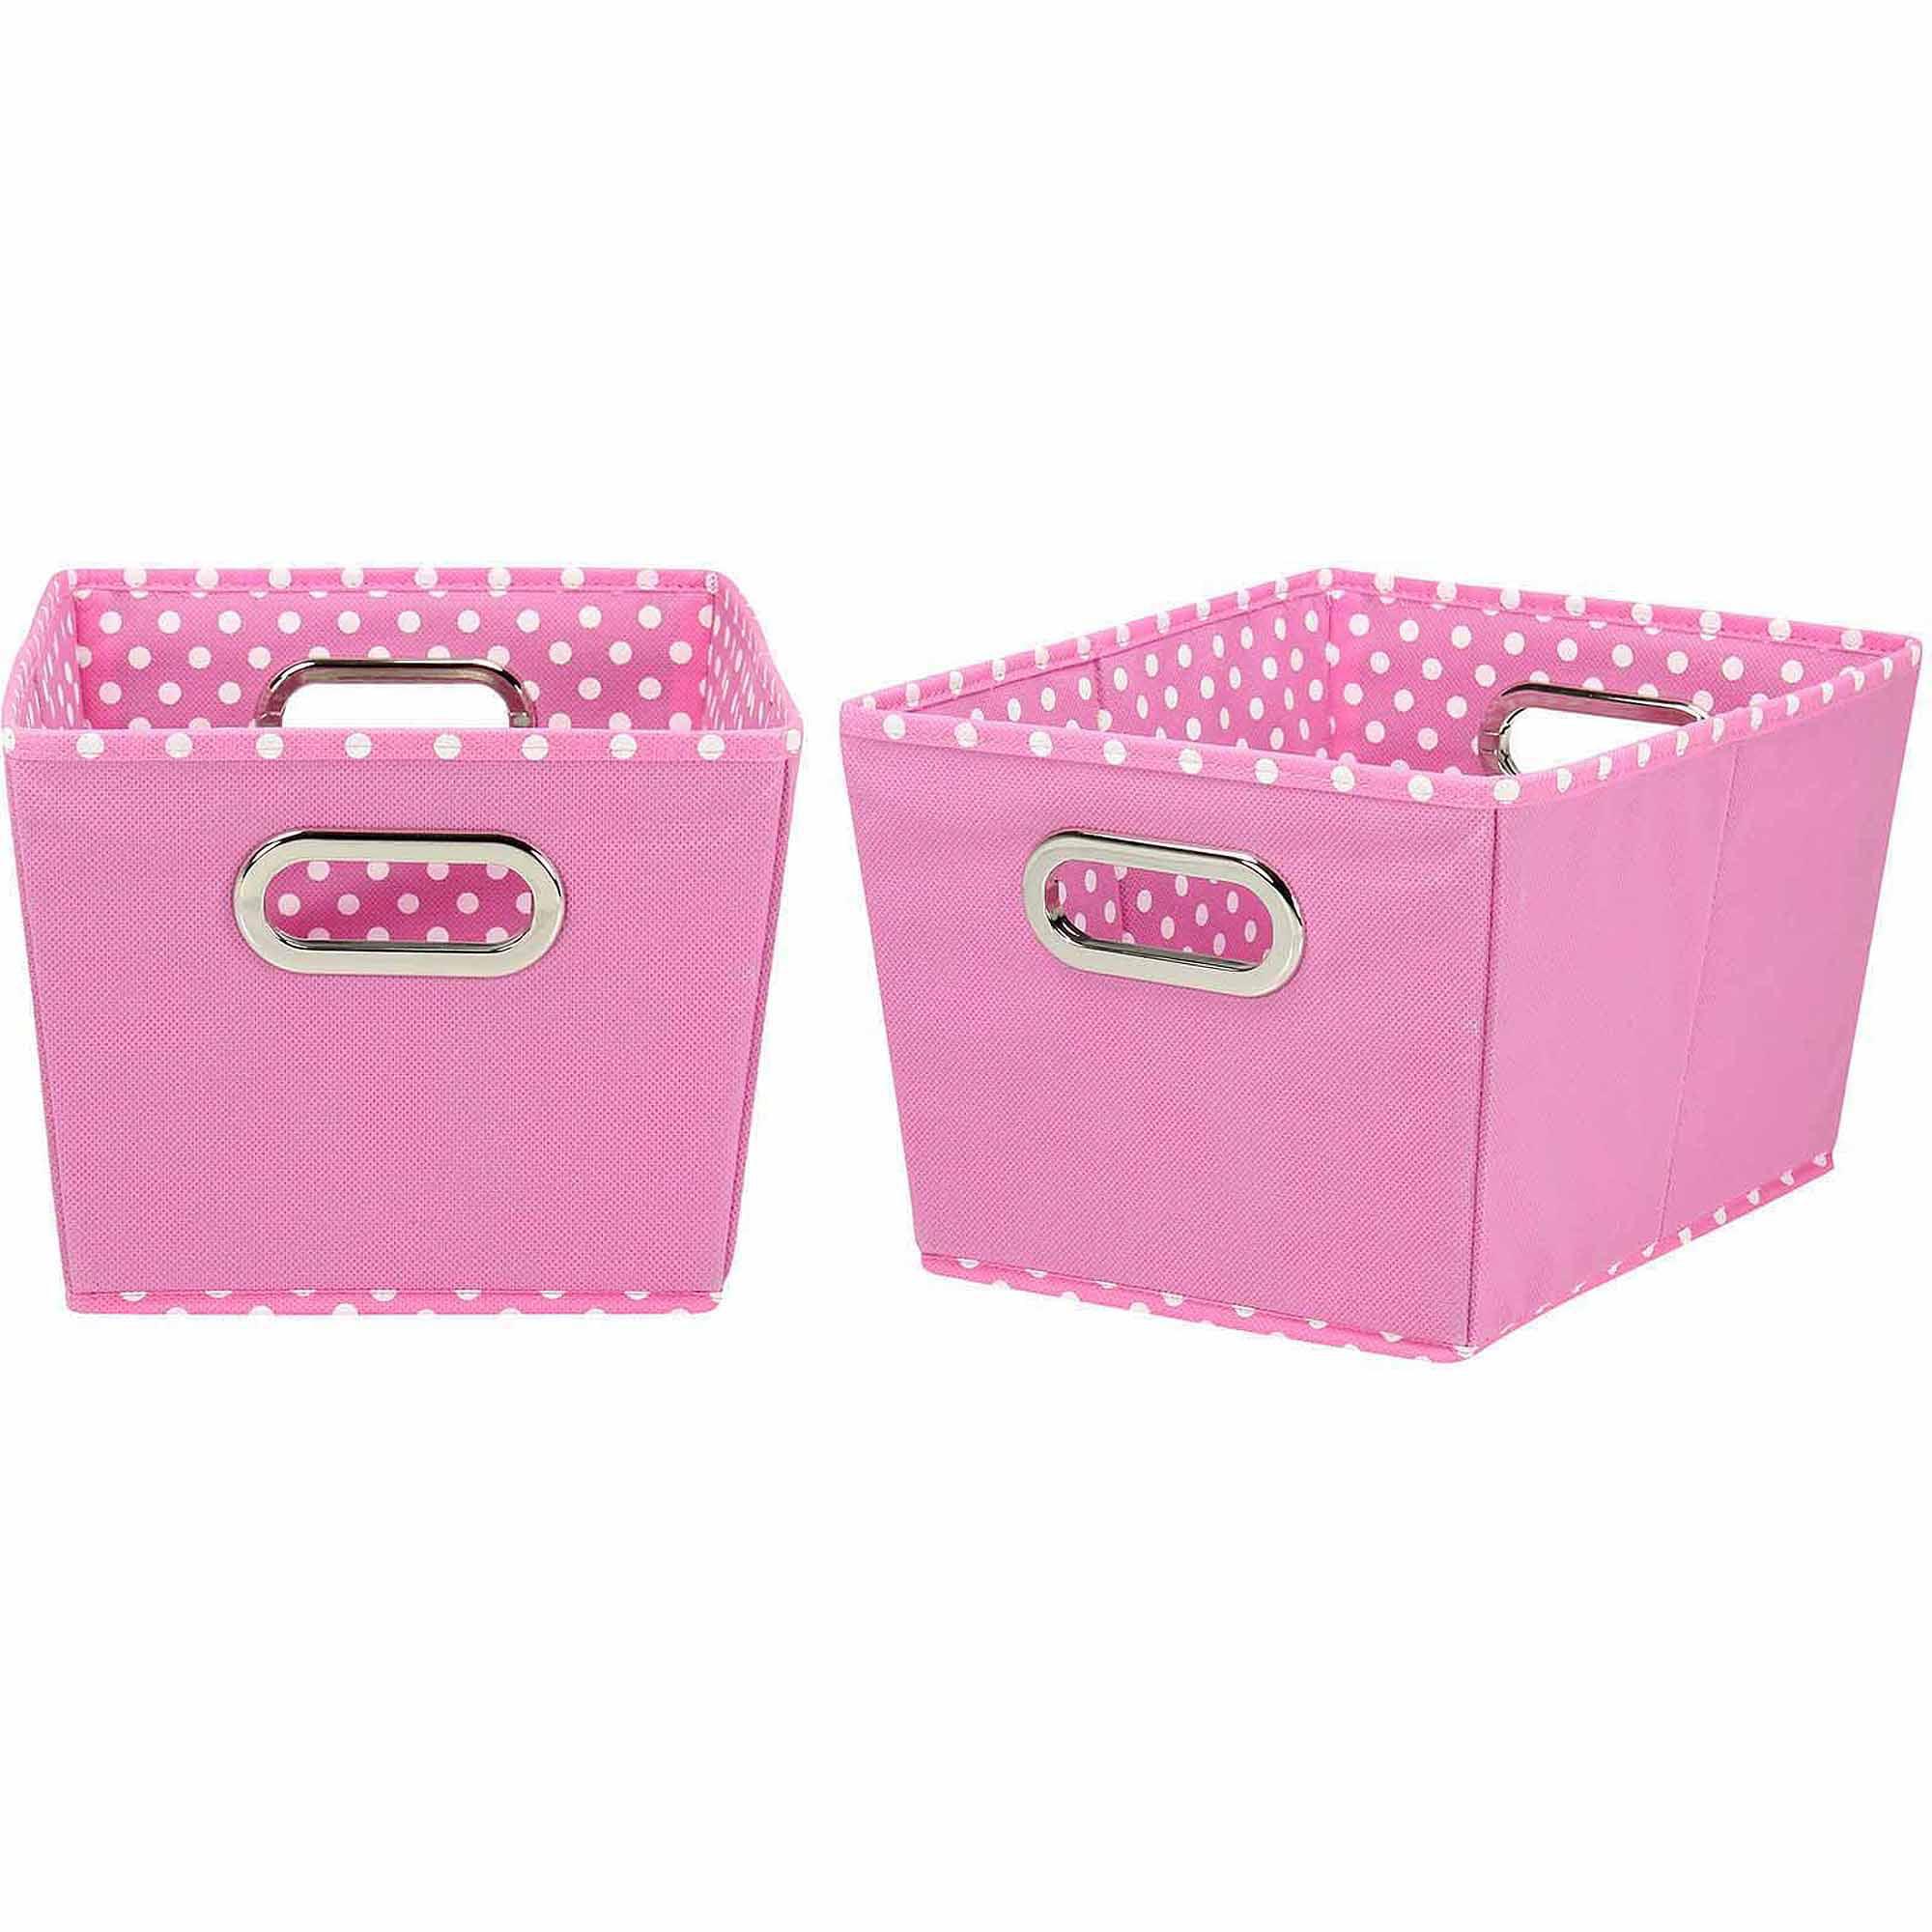 Household Essentials Small Decorative Storage Bins, 2pk, Pink and Mini Dot